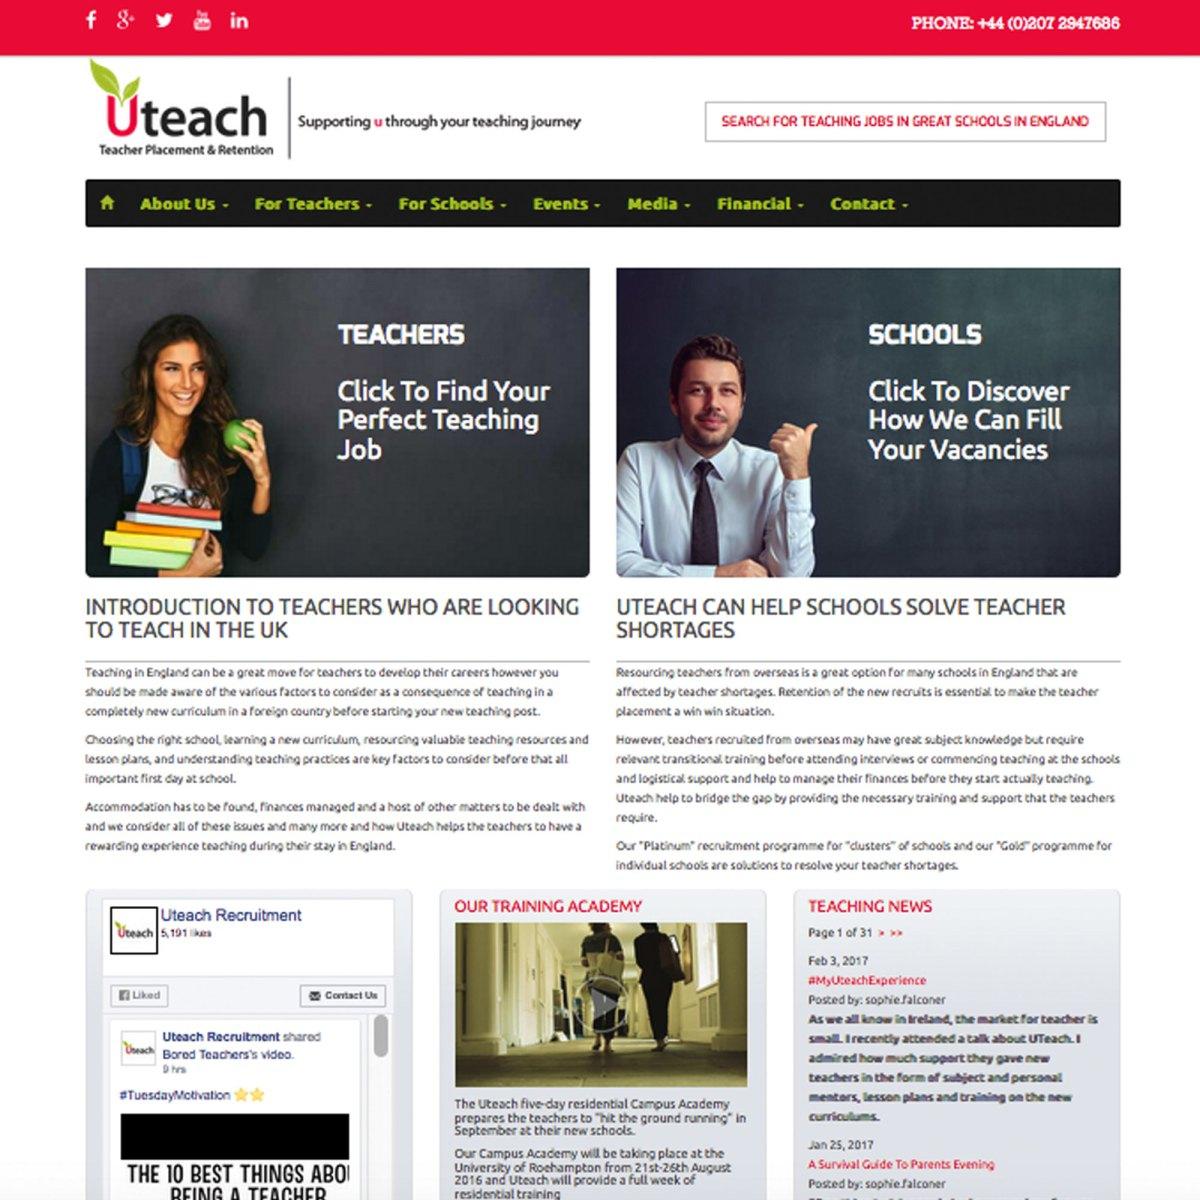 Uteach Recruitment